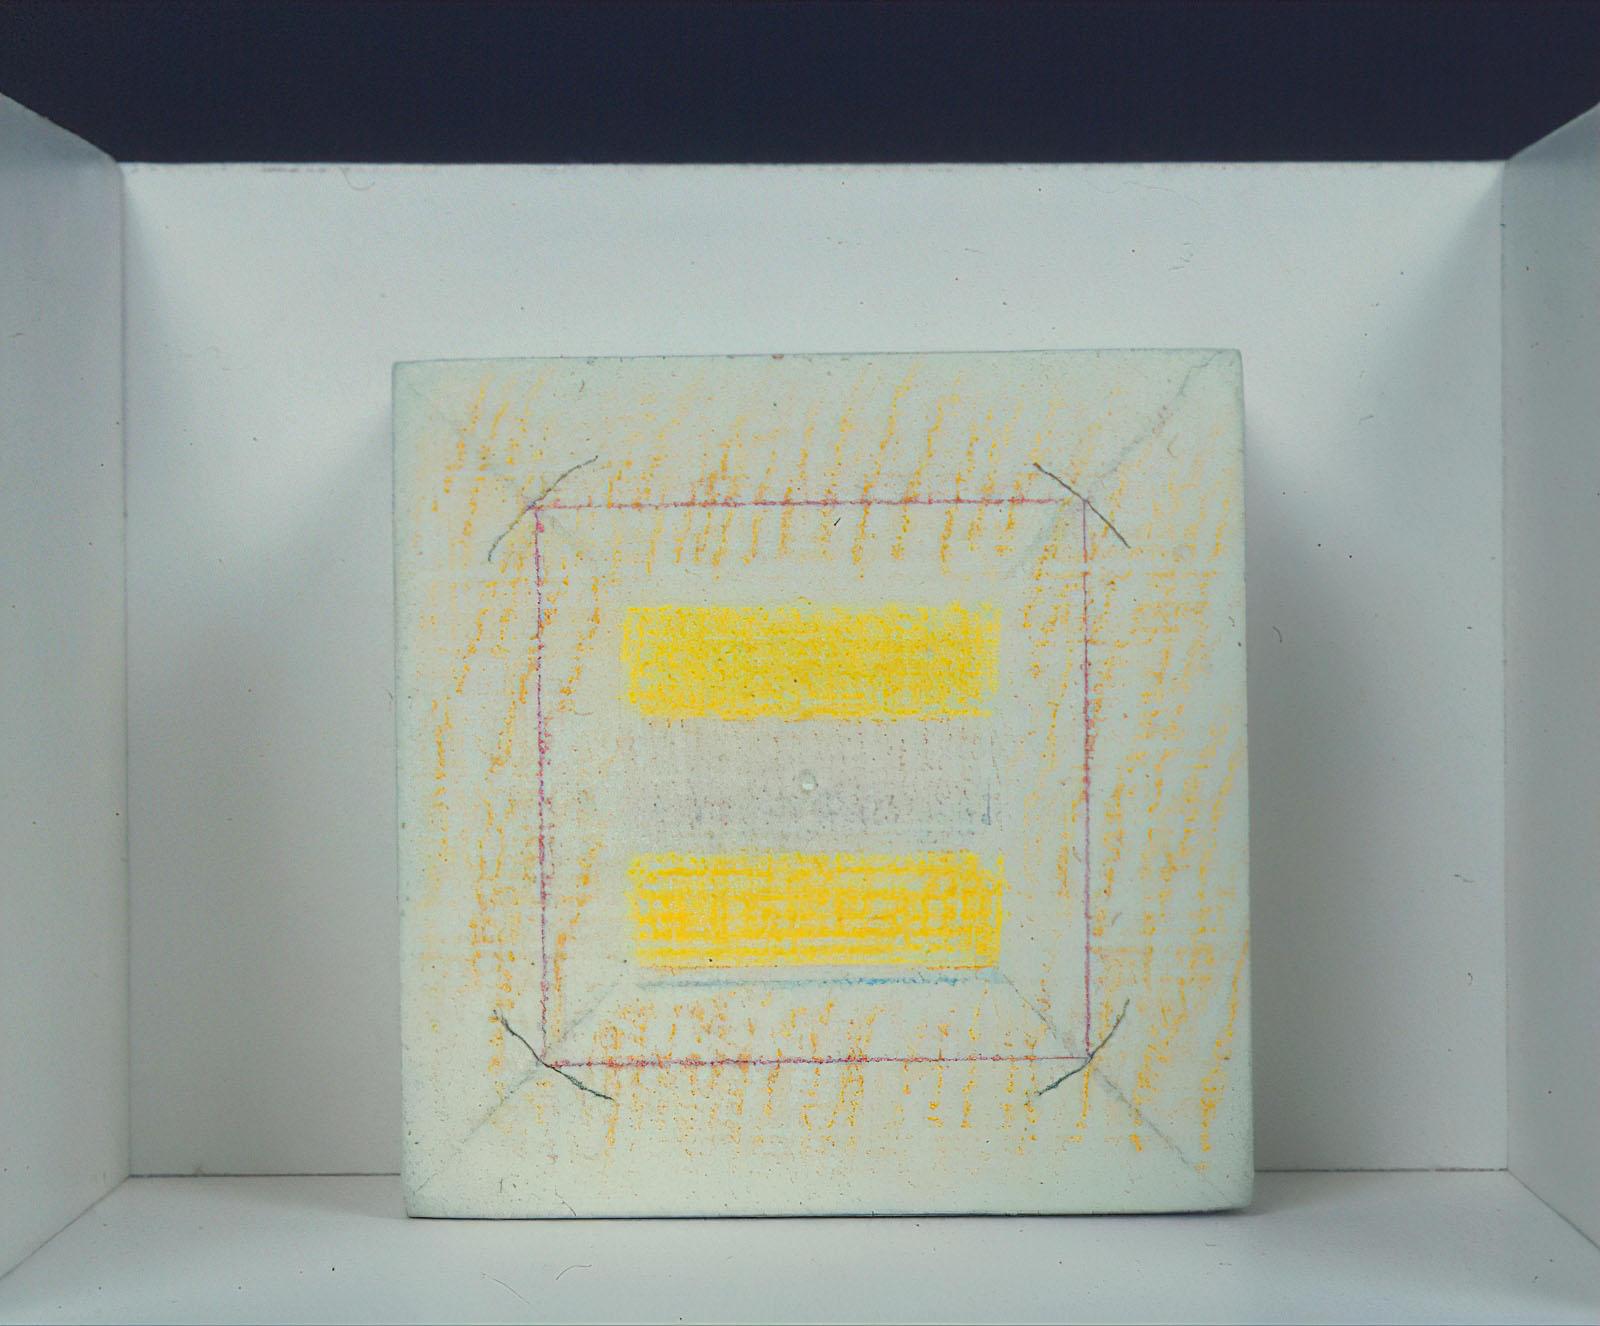 Riccardo Guarneri - Superficie-Grafia-Luce